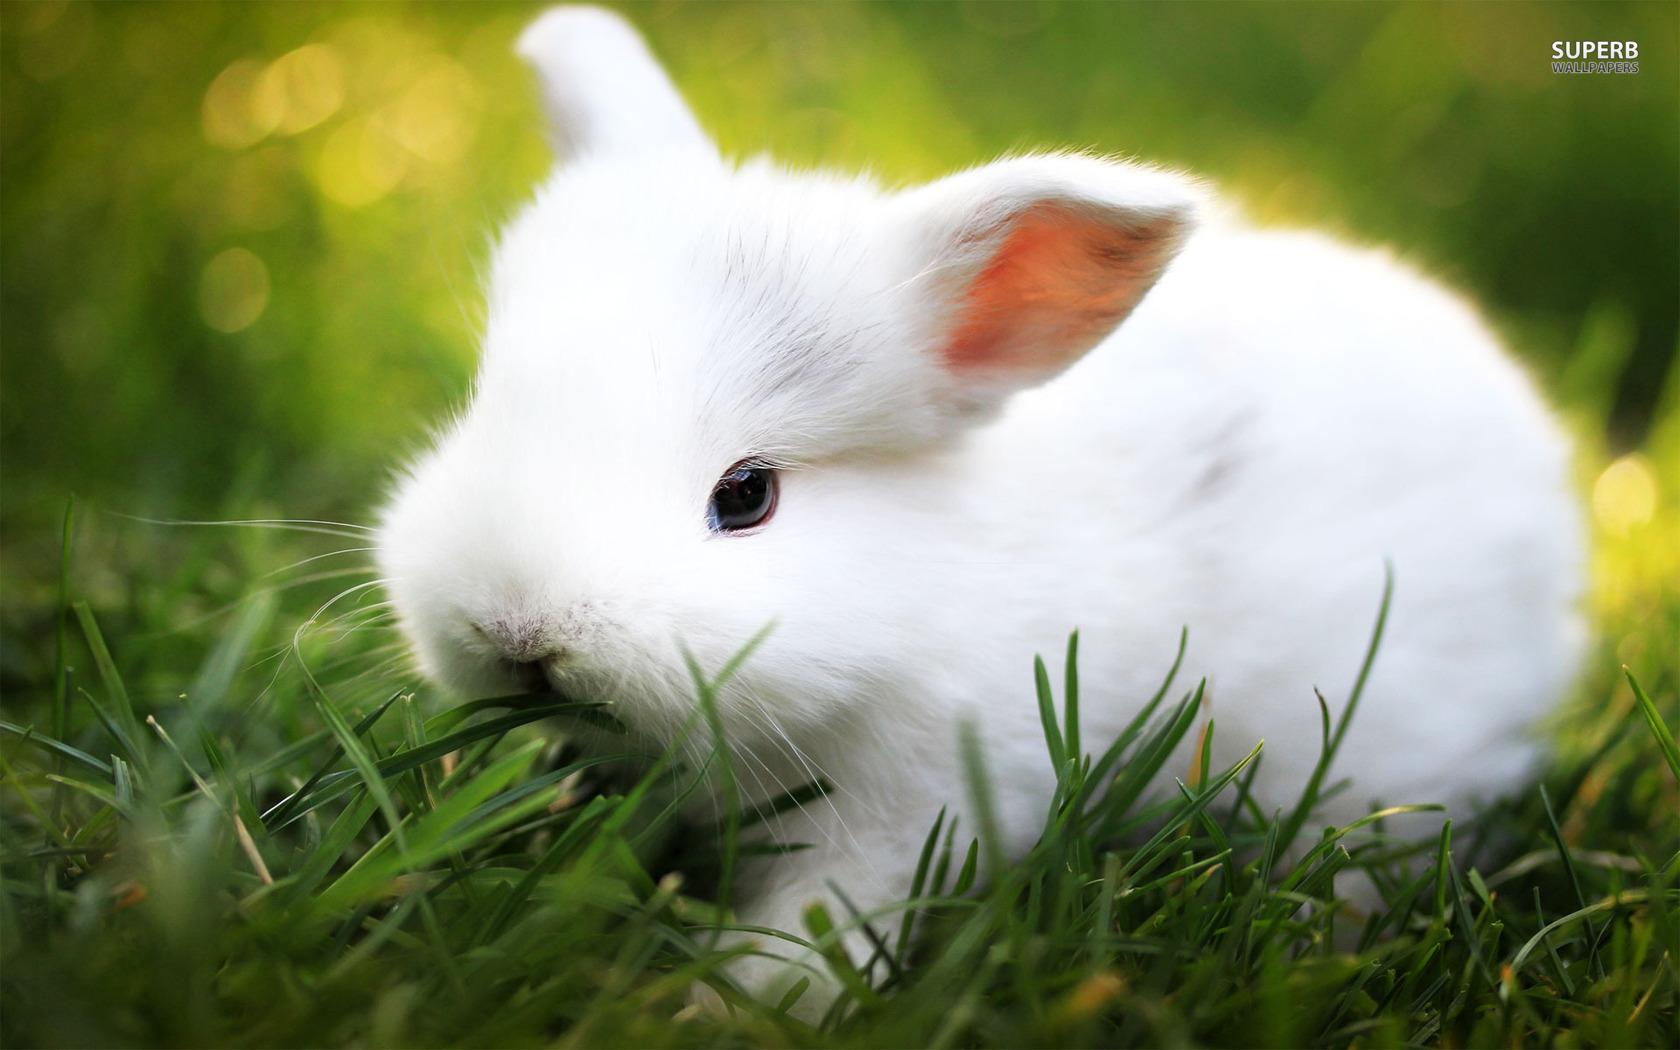 Cute White Baby Rabbits Wallpapers White Rabbit Wallpaper 2160x1920 84582